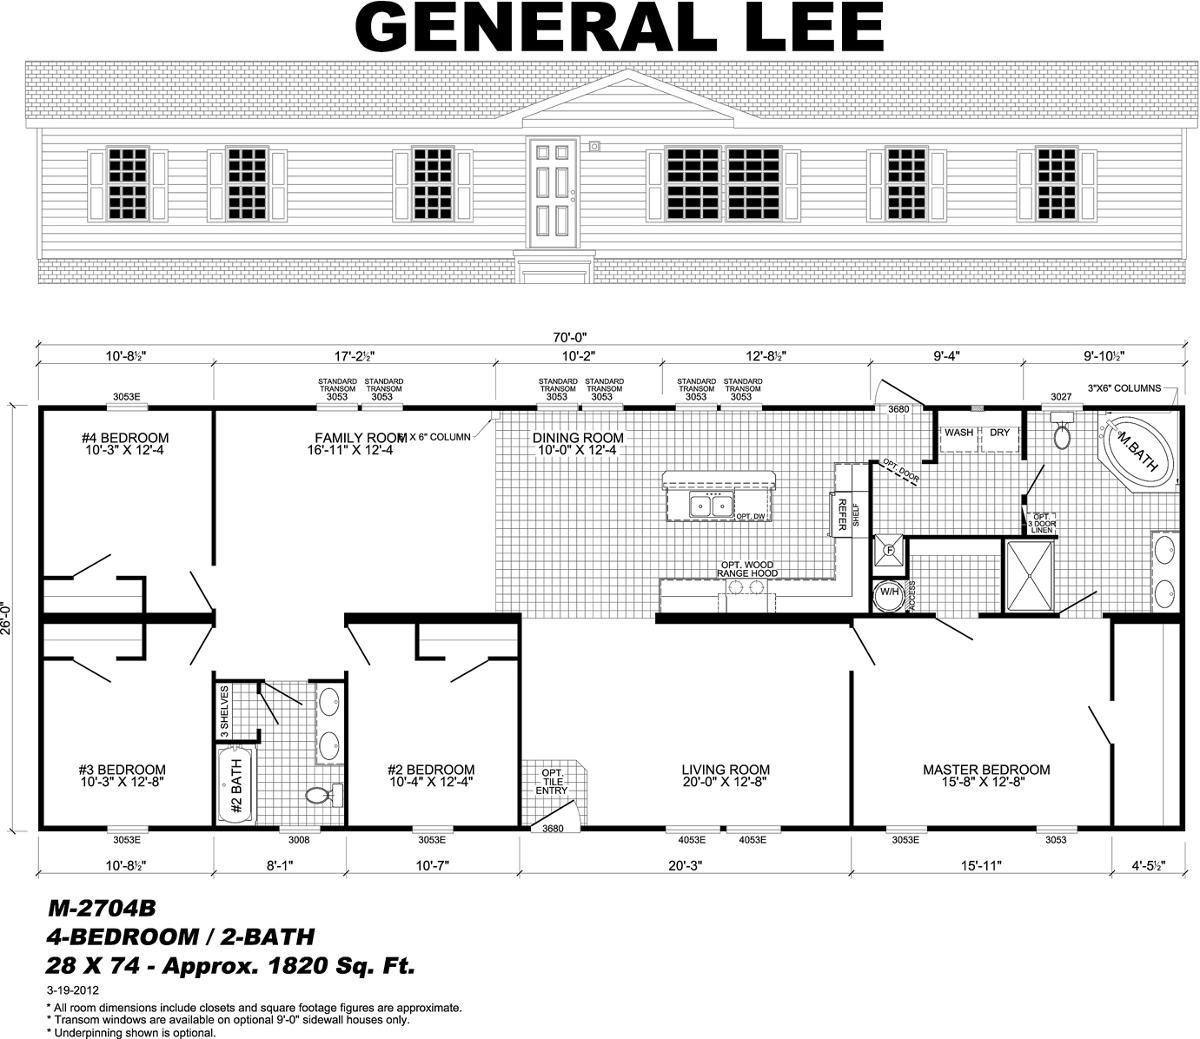 Travel Trailer Sales Near Me >> General Lee | manufactured homes | Pinterest | General lee ...